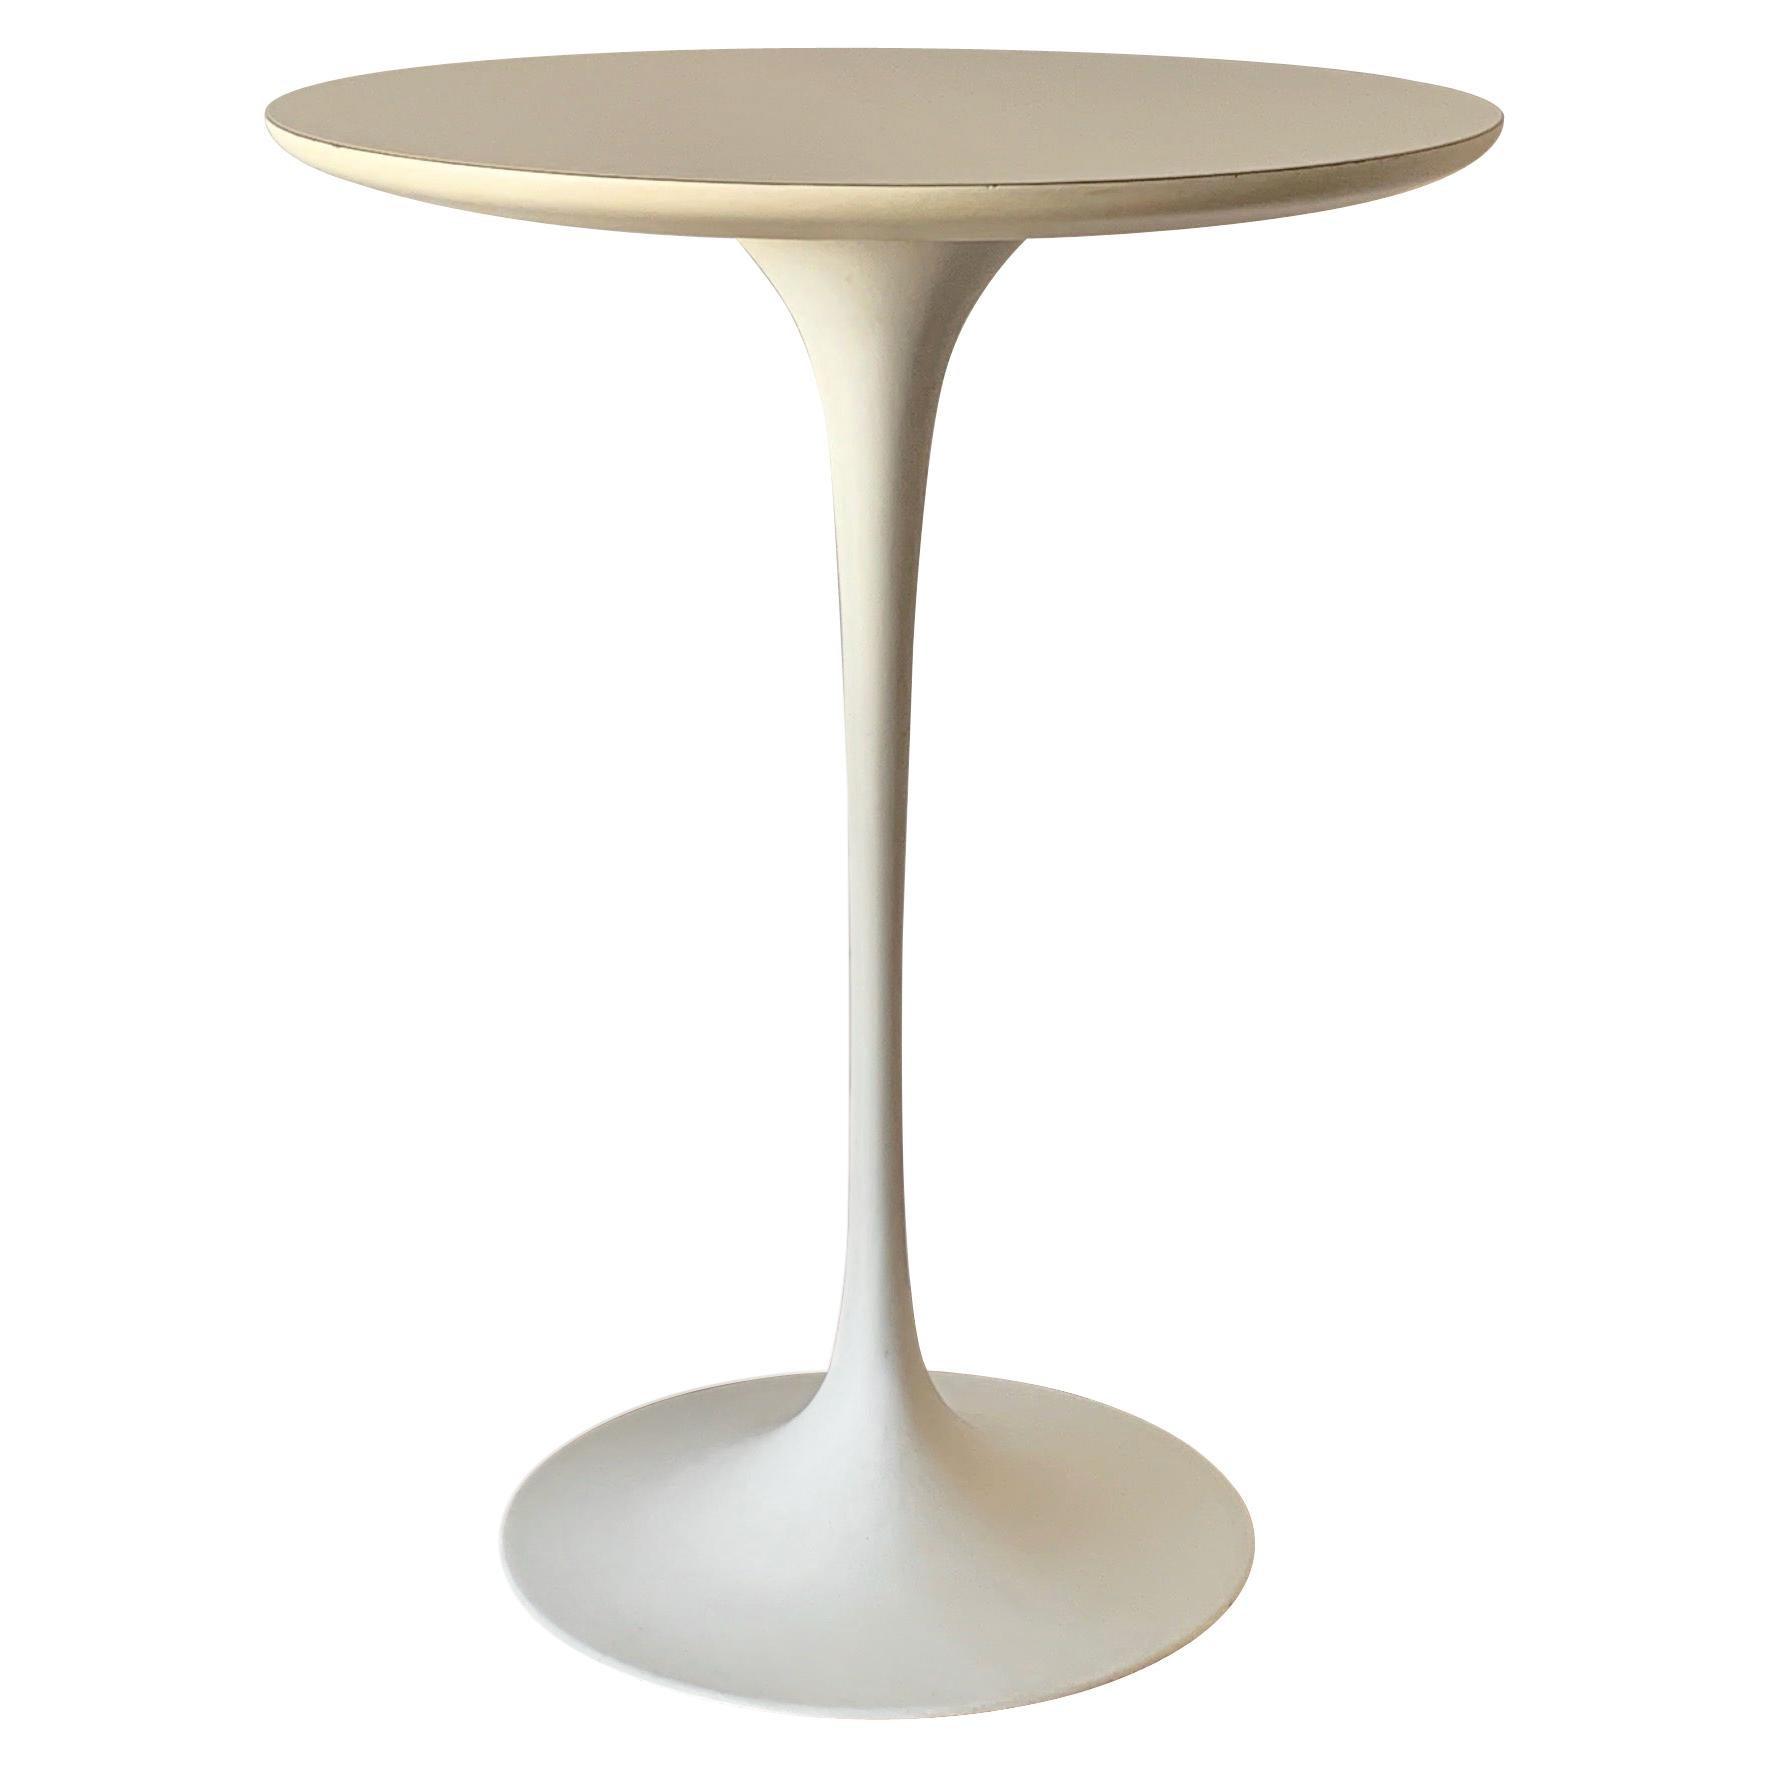 Original Eero Saarinen for Knoll International Tulip Side Table